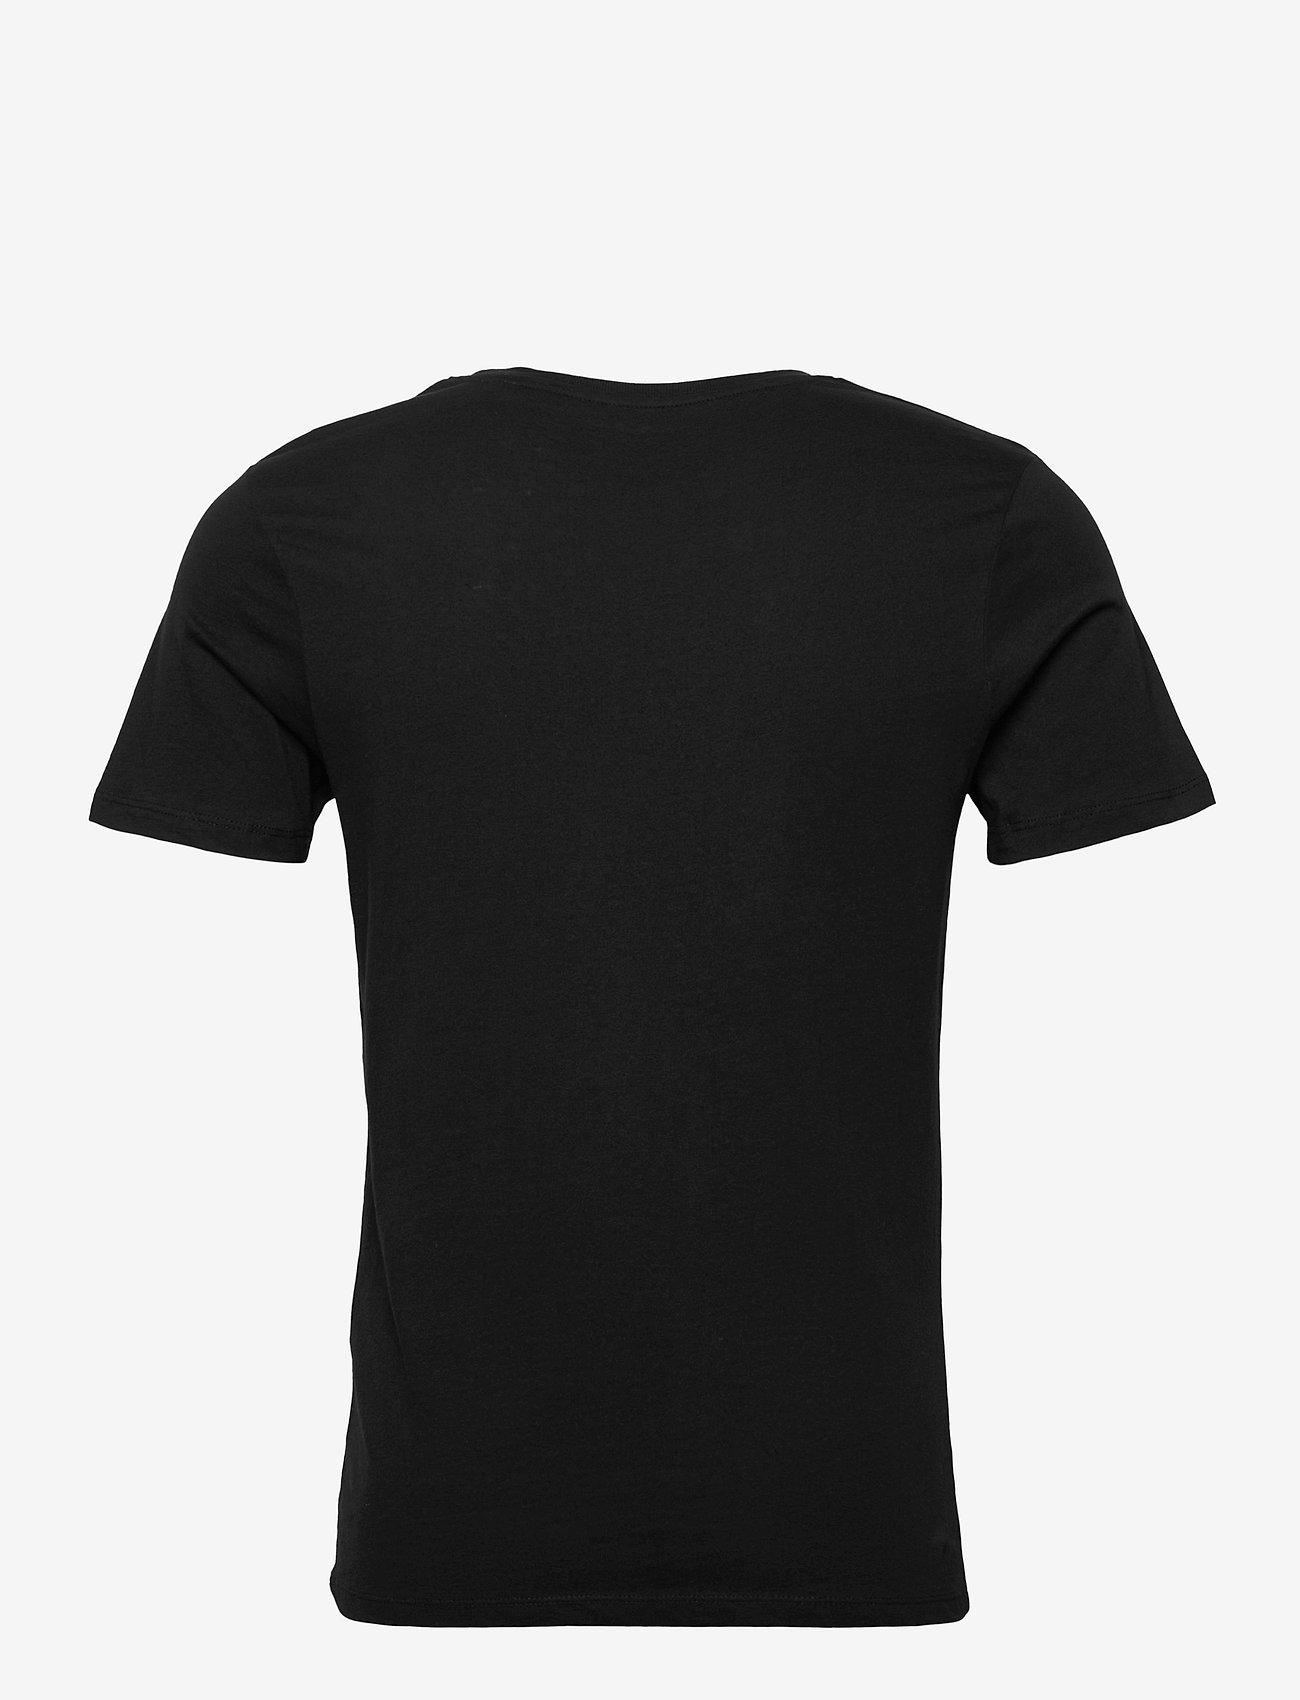 Jack & Jones - JJEJEANS TEE SS CREW NECK  20/21 - kortärmade t-shirts - black - 1